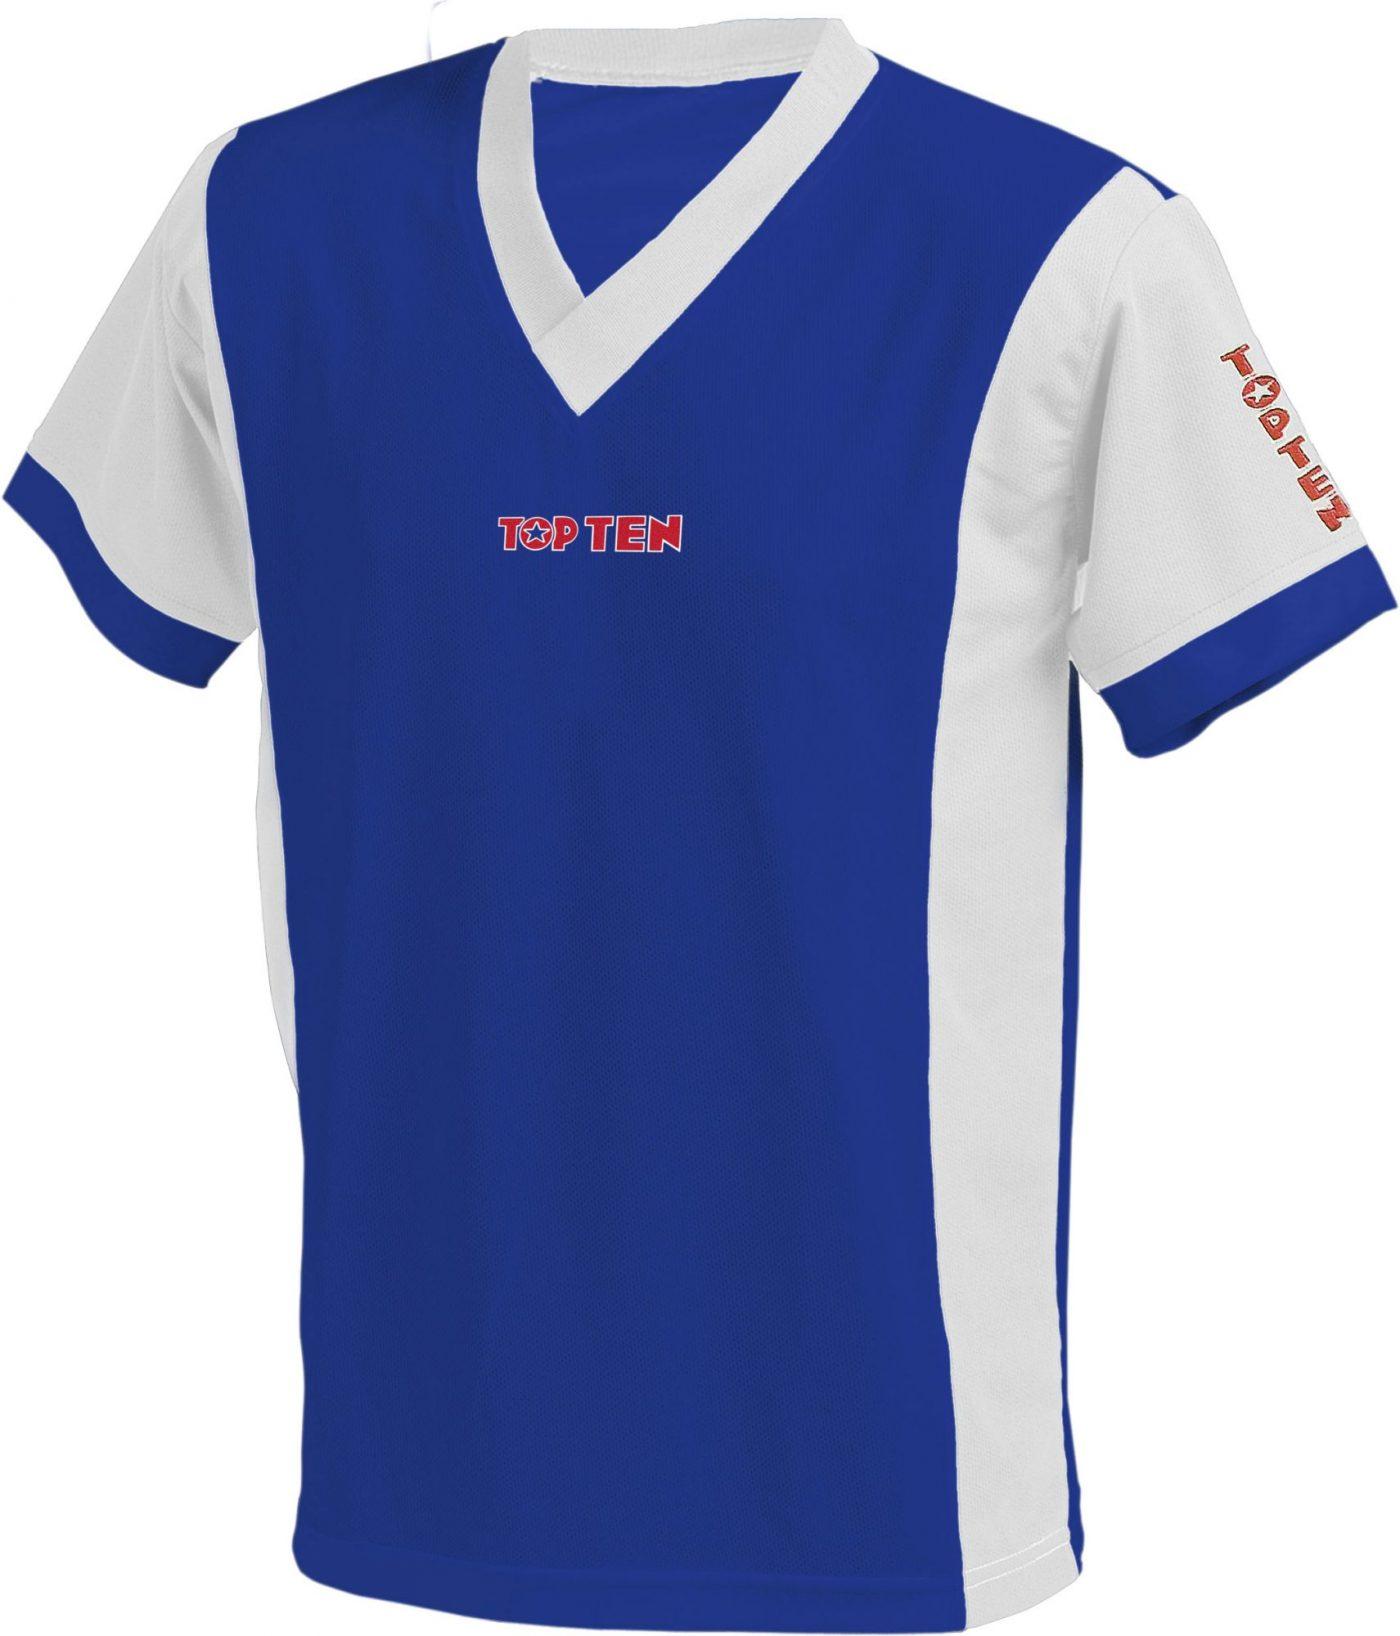 "TOP TEN T-Shirt  V-Hals ""UNISEX"" Blauw - Wit"